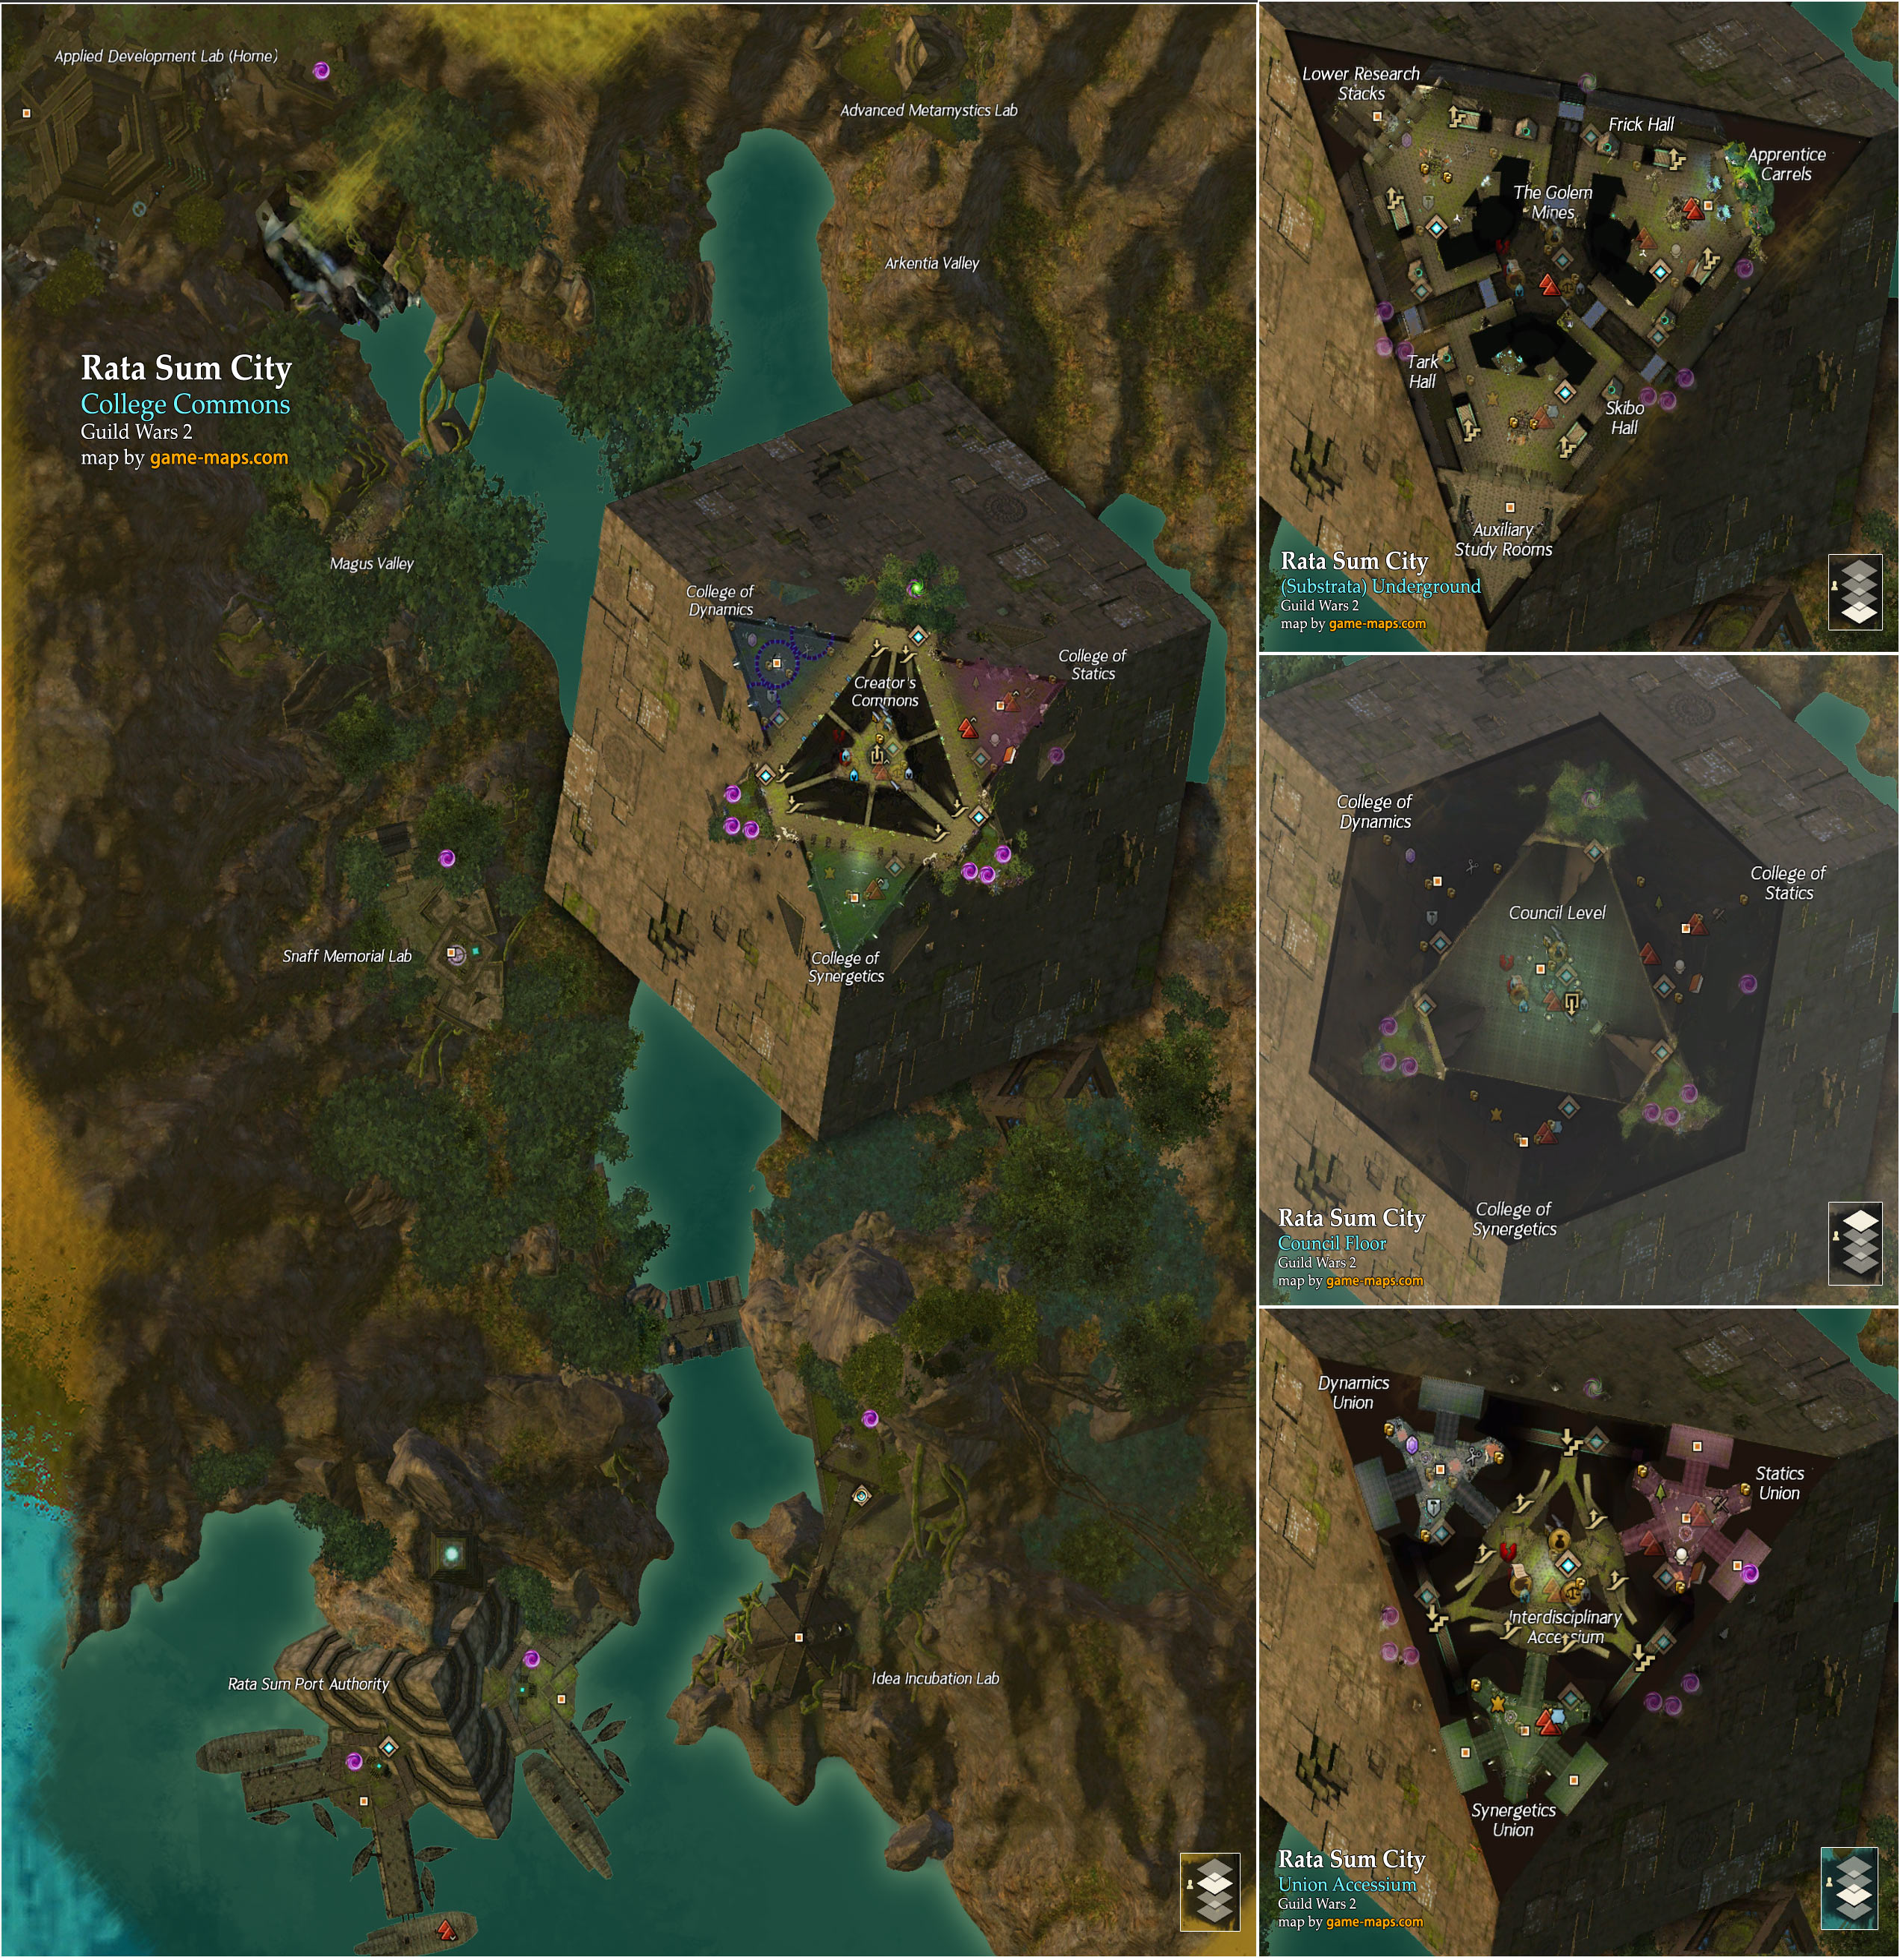 Guild Wars 1 World Map.Rata Sum City Map Guild Wars 2 Game Maps Com